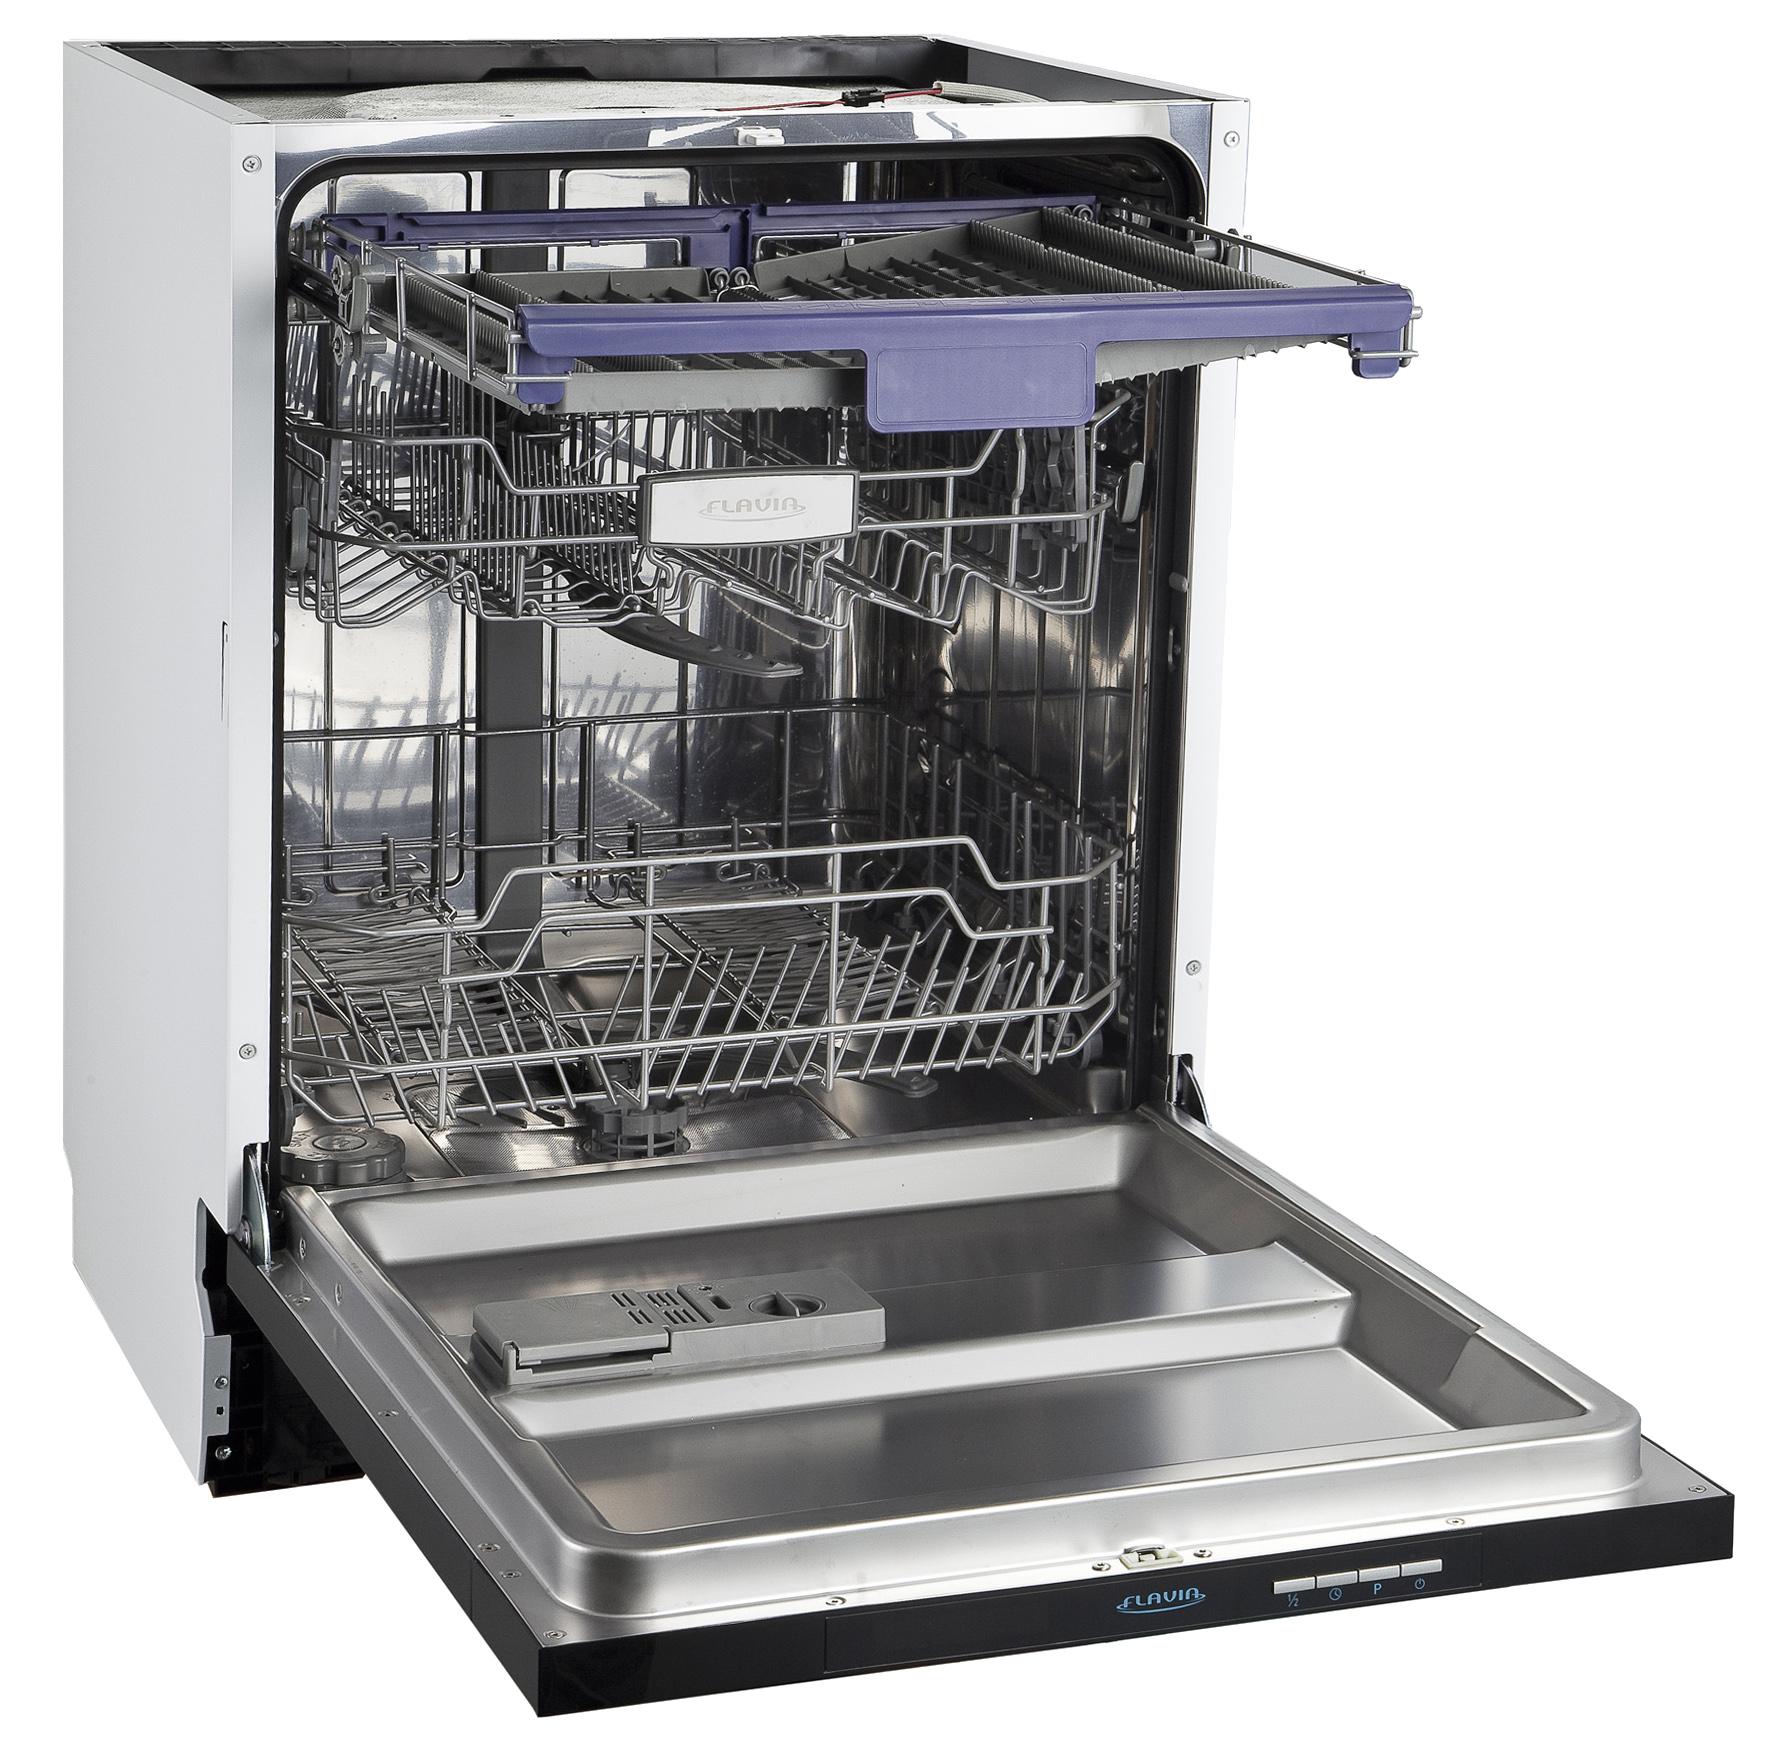 Посудомоечная машина Flavia Real Brand Technics 13990.000